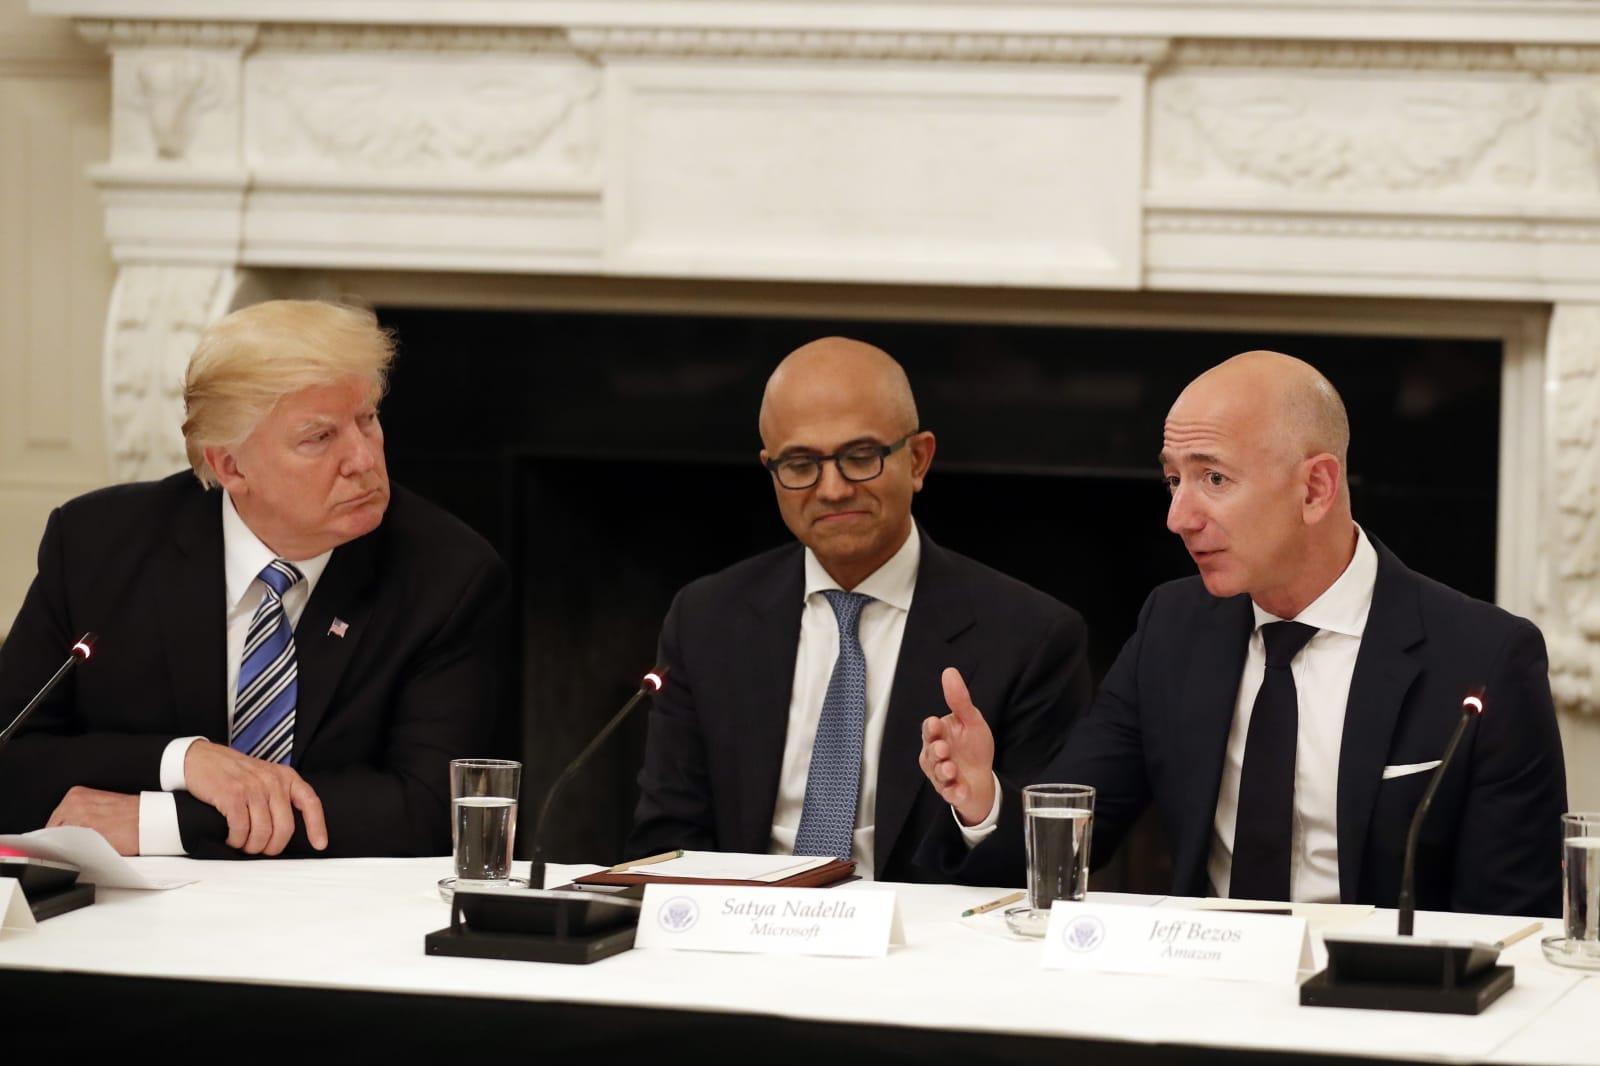 Pentagon puts $10 billion contract on hold after Trump criticizes Amazon